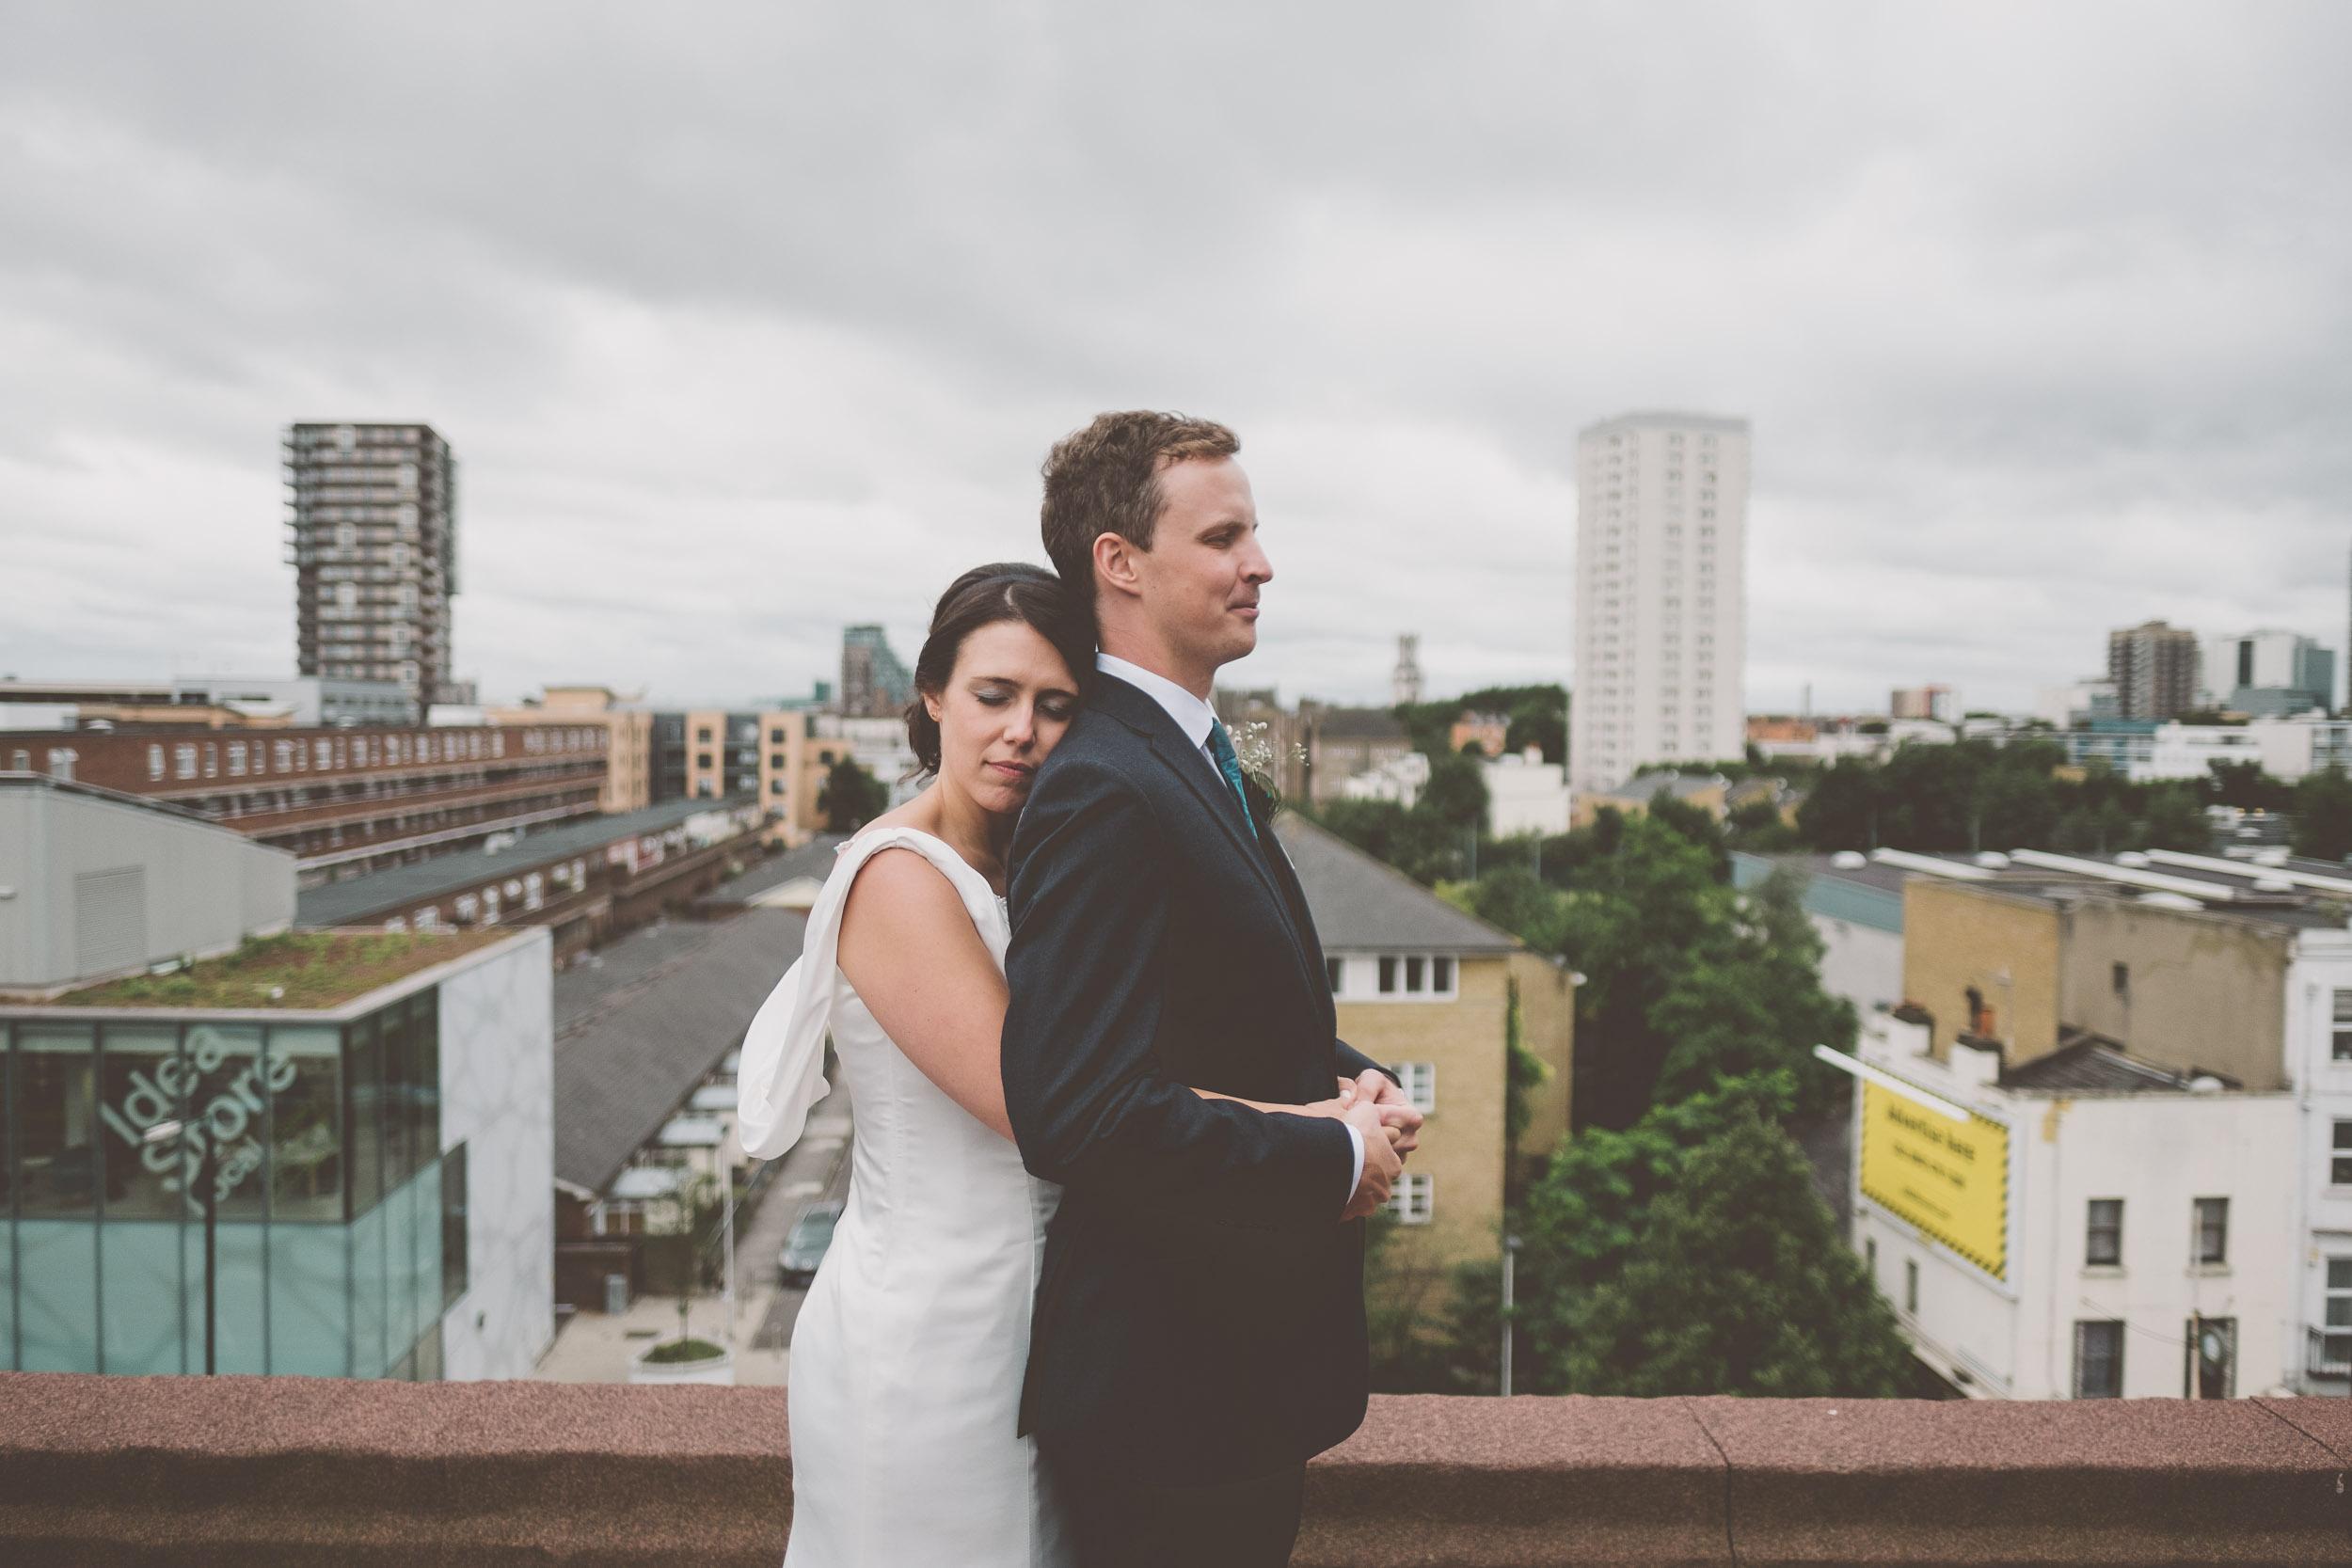 islington-town-hall-4th-floor-studios-wedding289.jpg